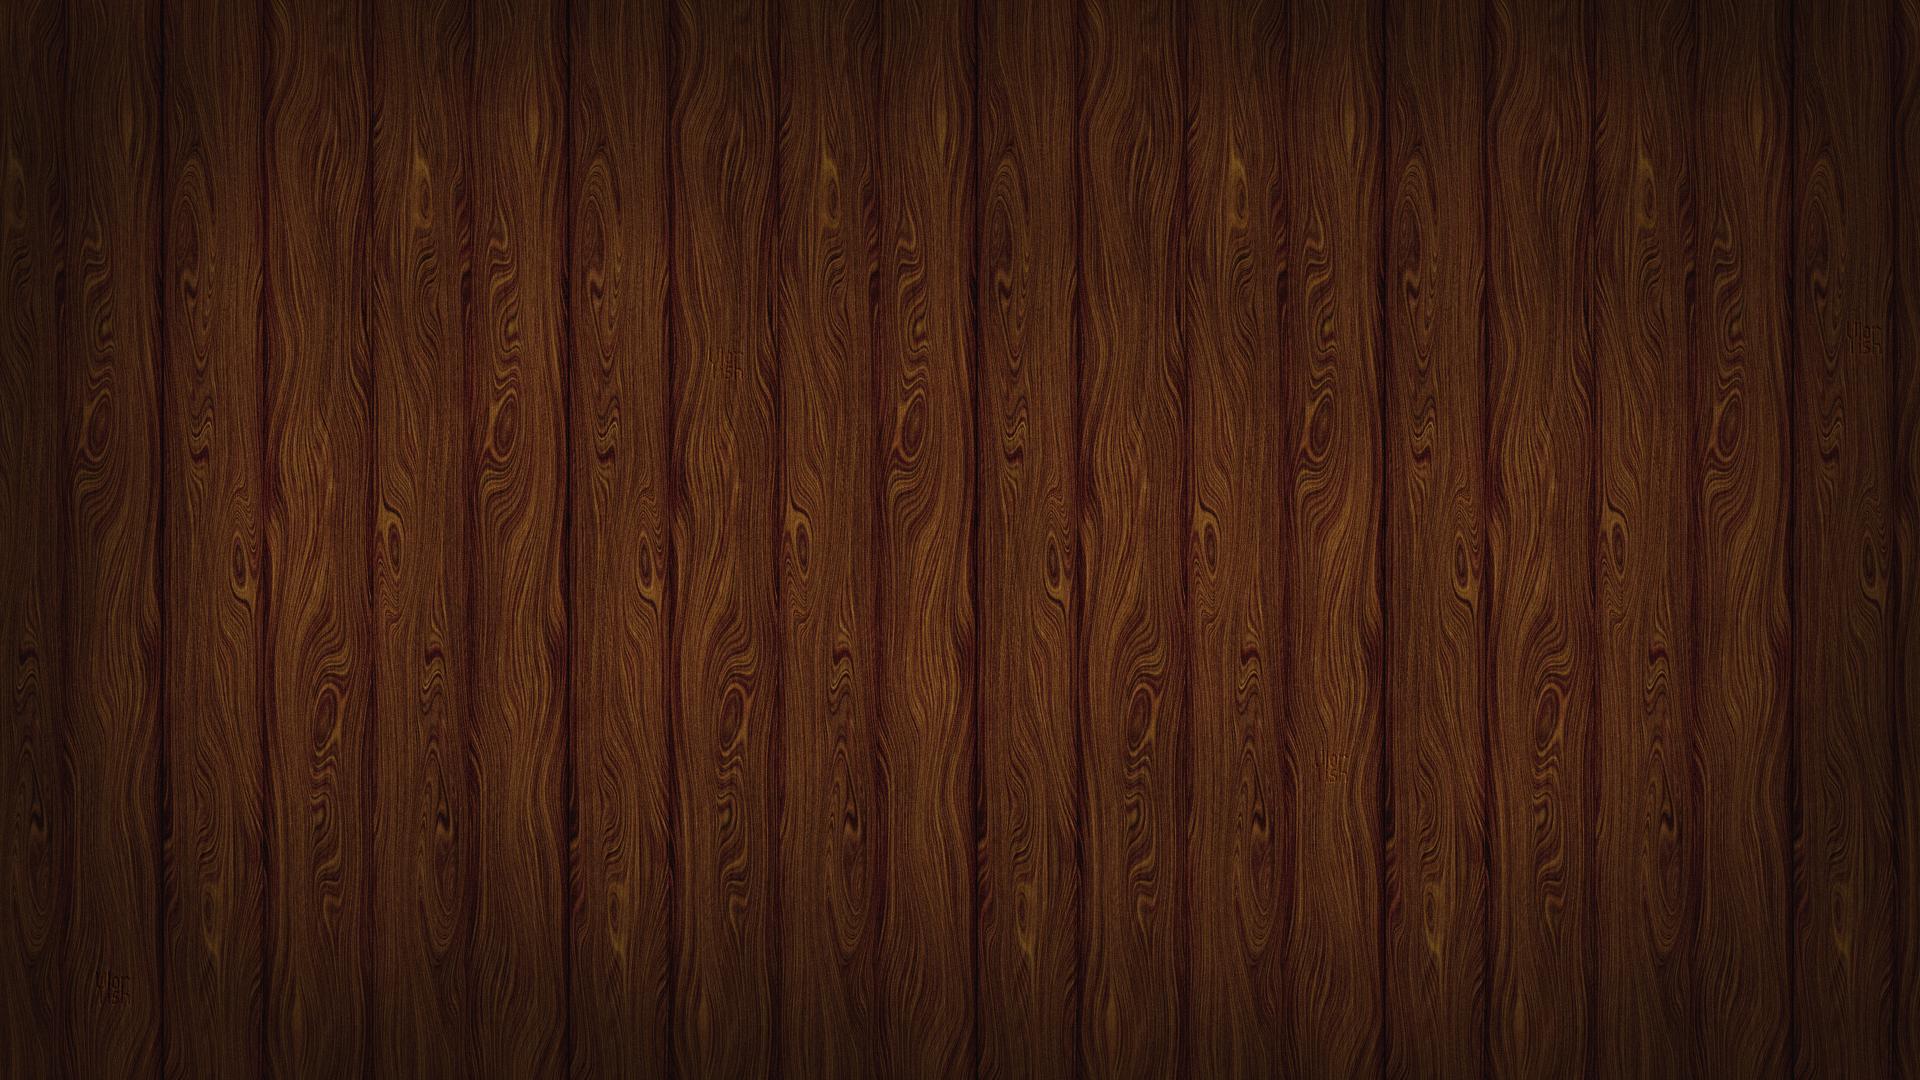 Wood Texture Hd Wallpaper Wallpaper List 1920x1080